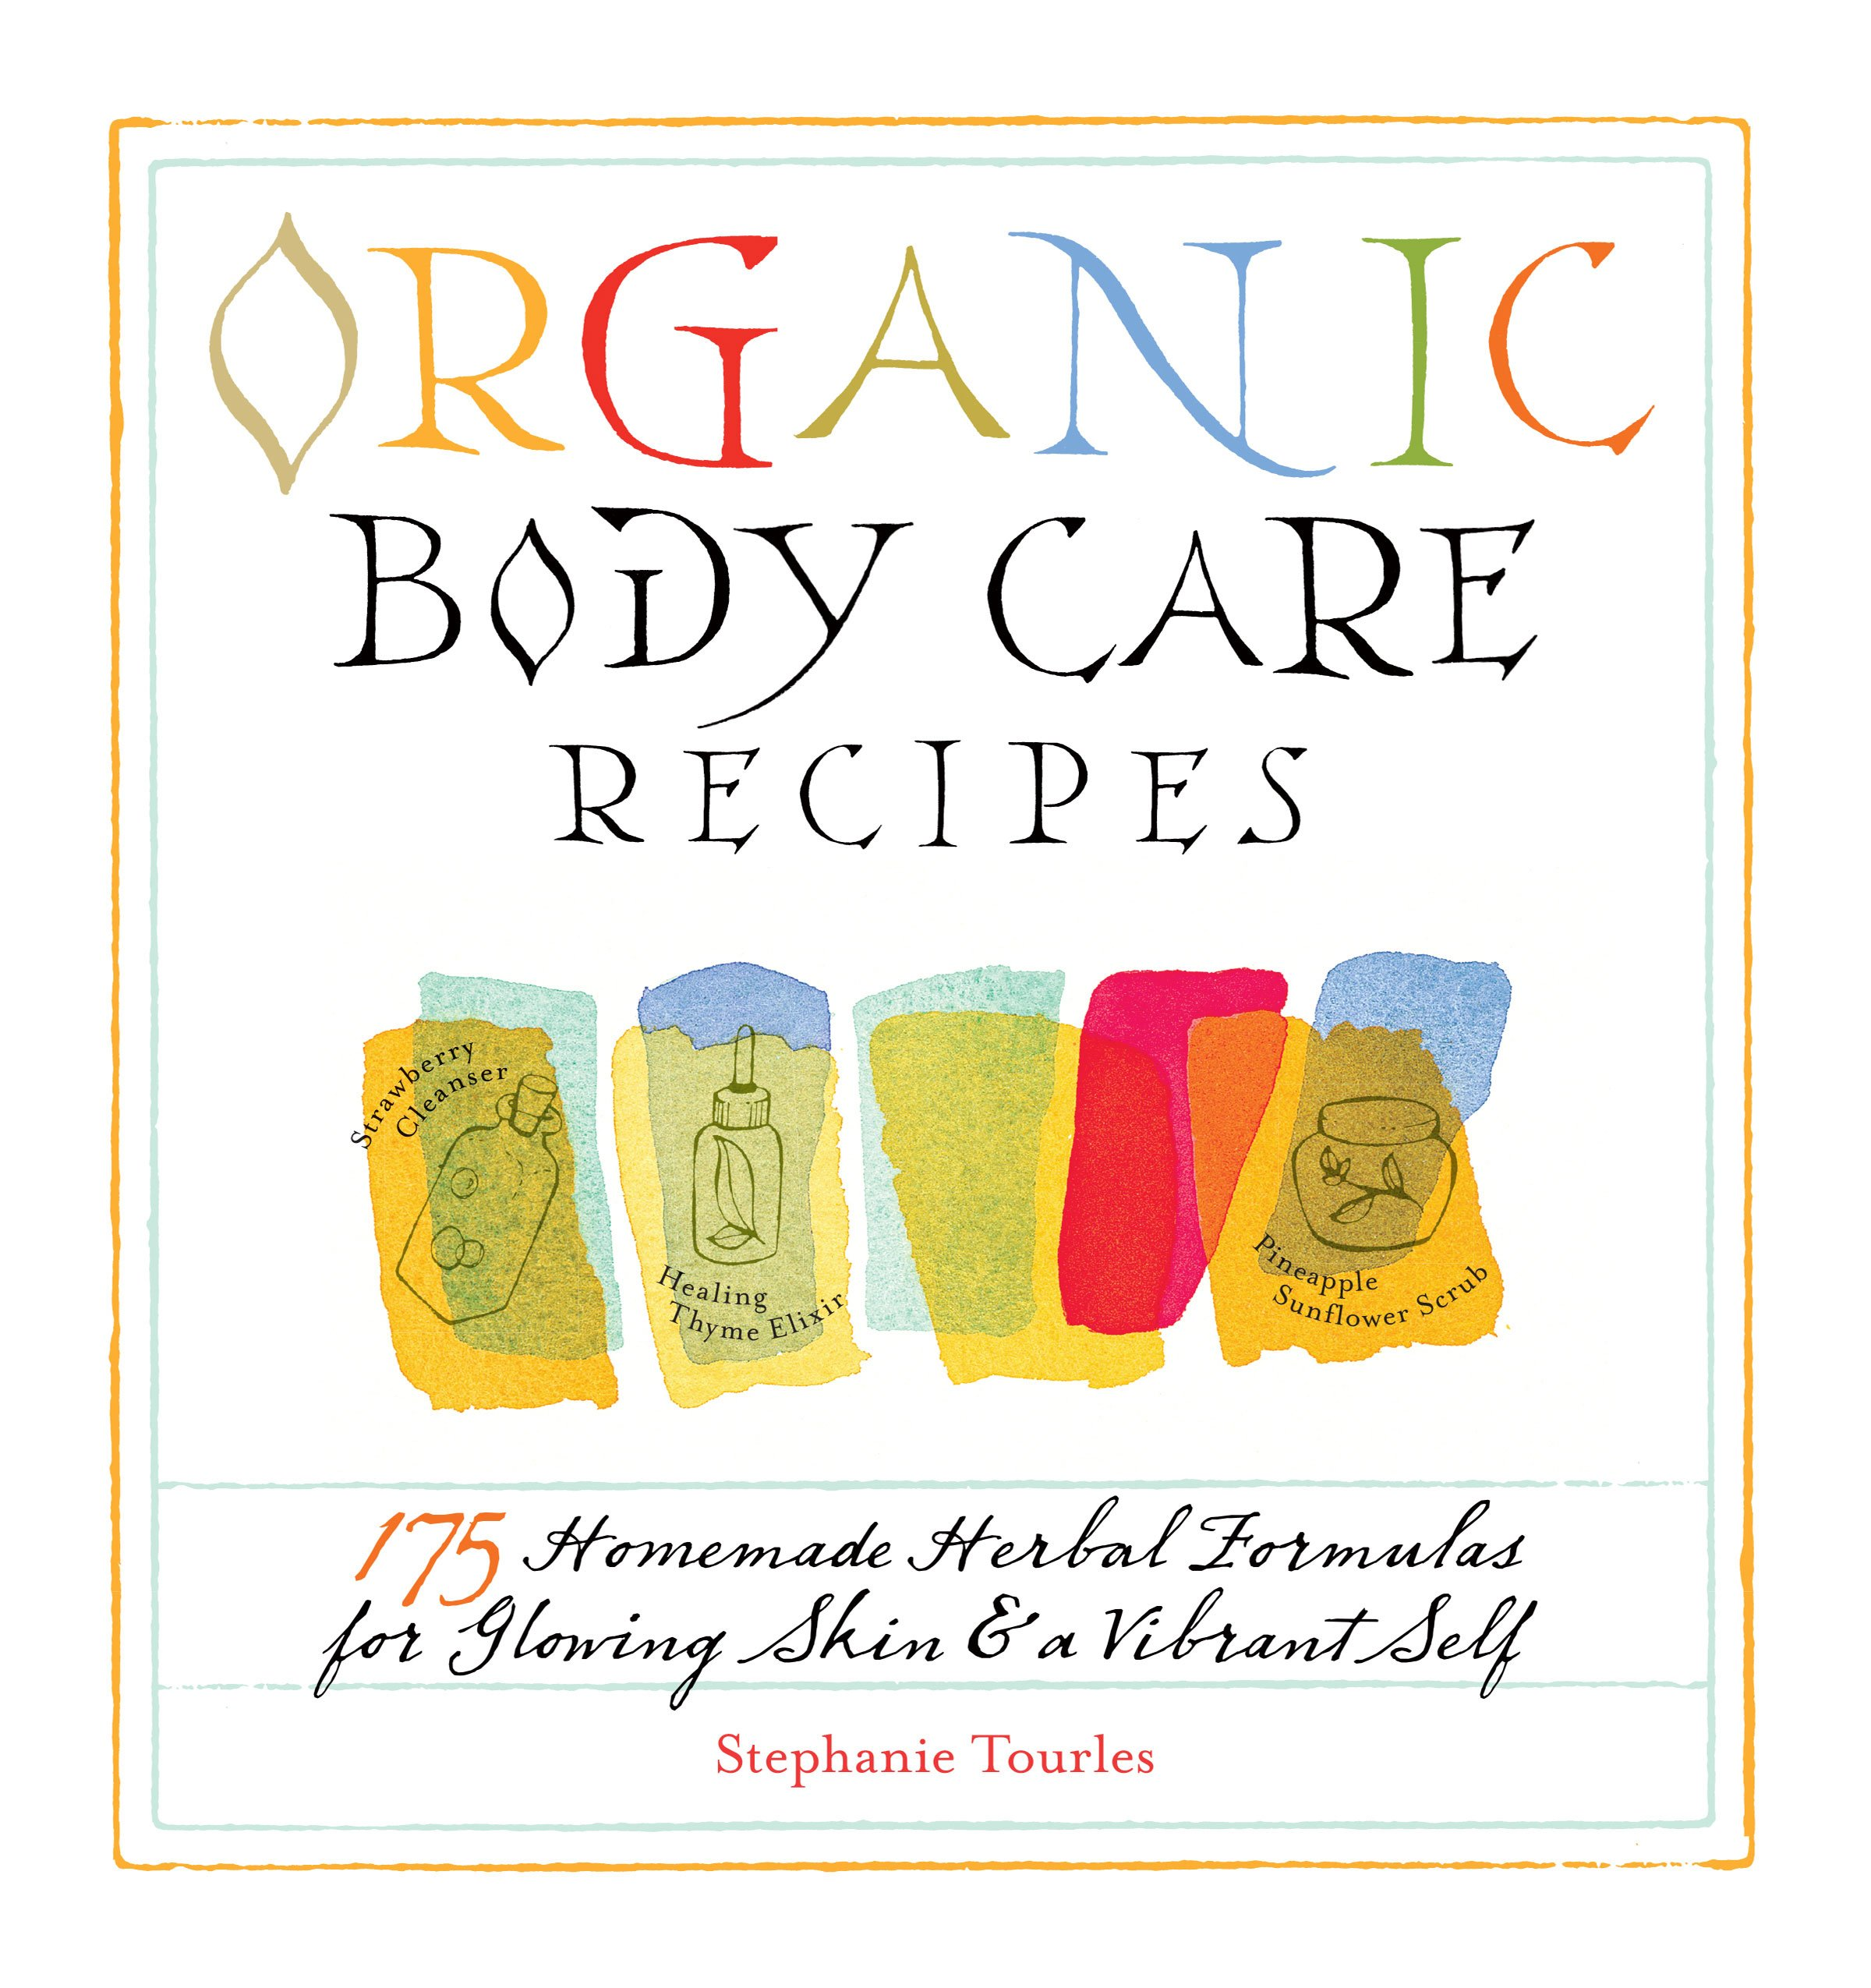 Organic Body Care Recipes Homemade product image